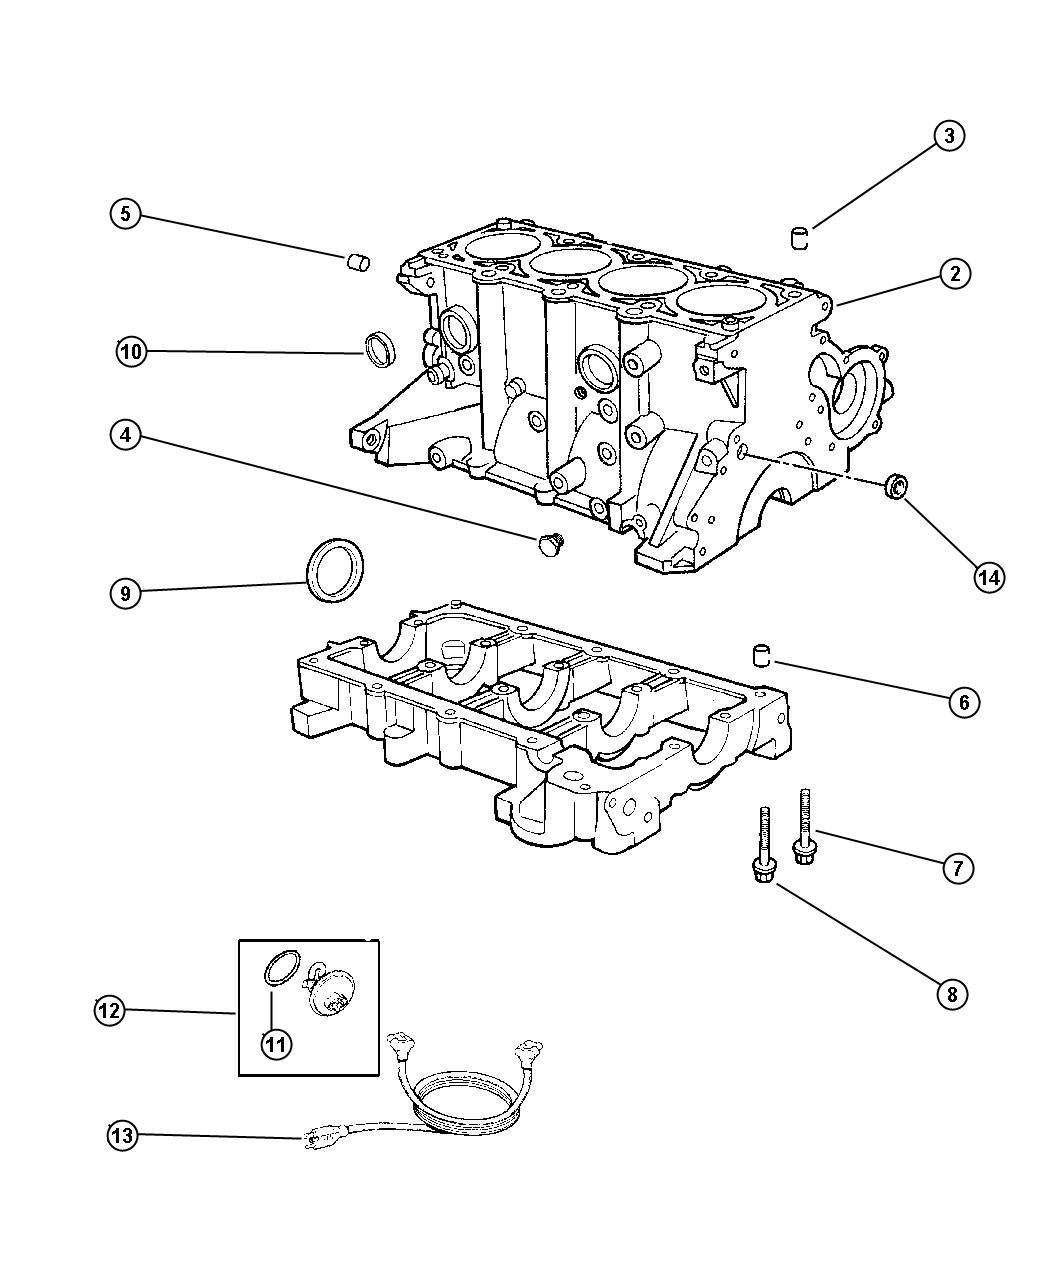 Chrysler Sebring Block Short Cylinder Edz Dohc